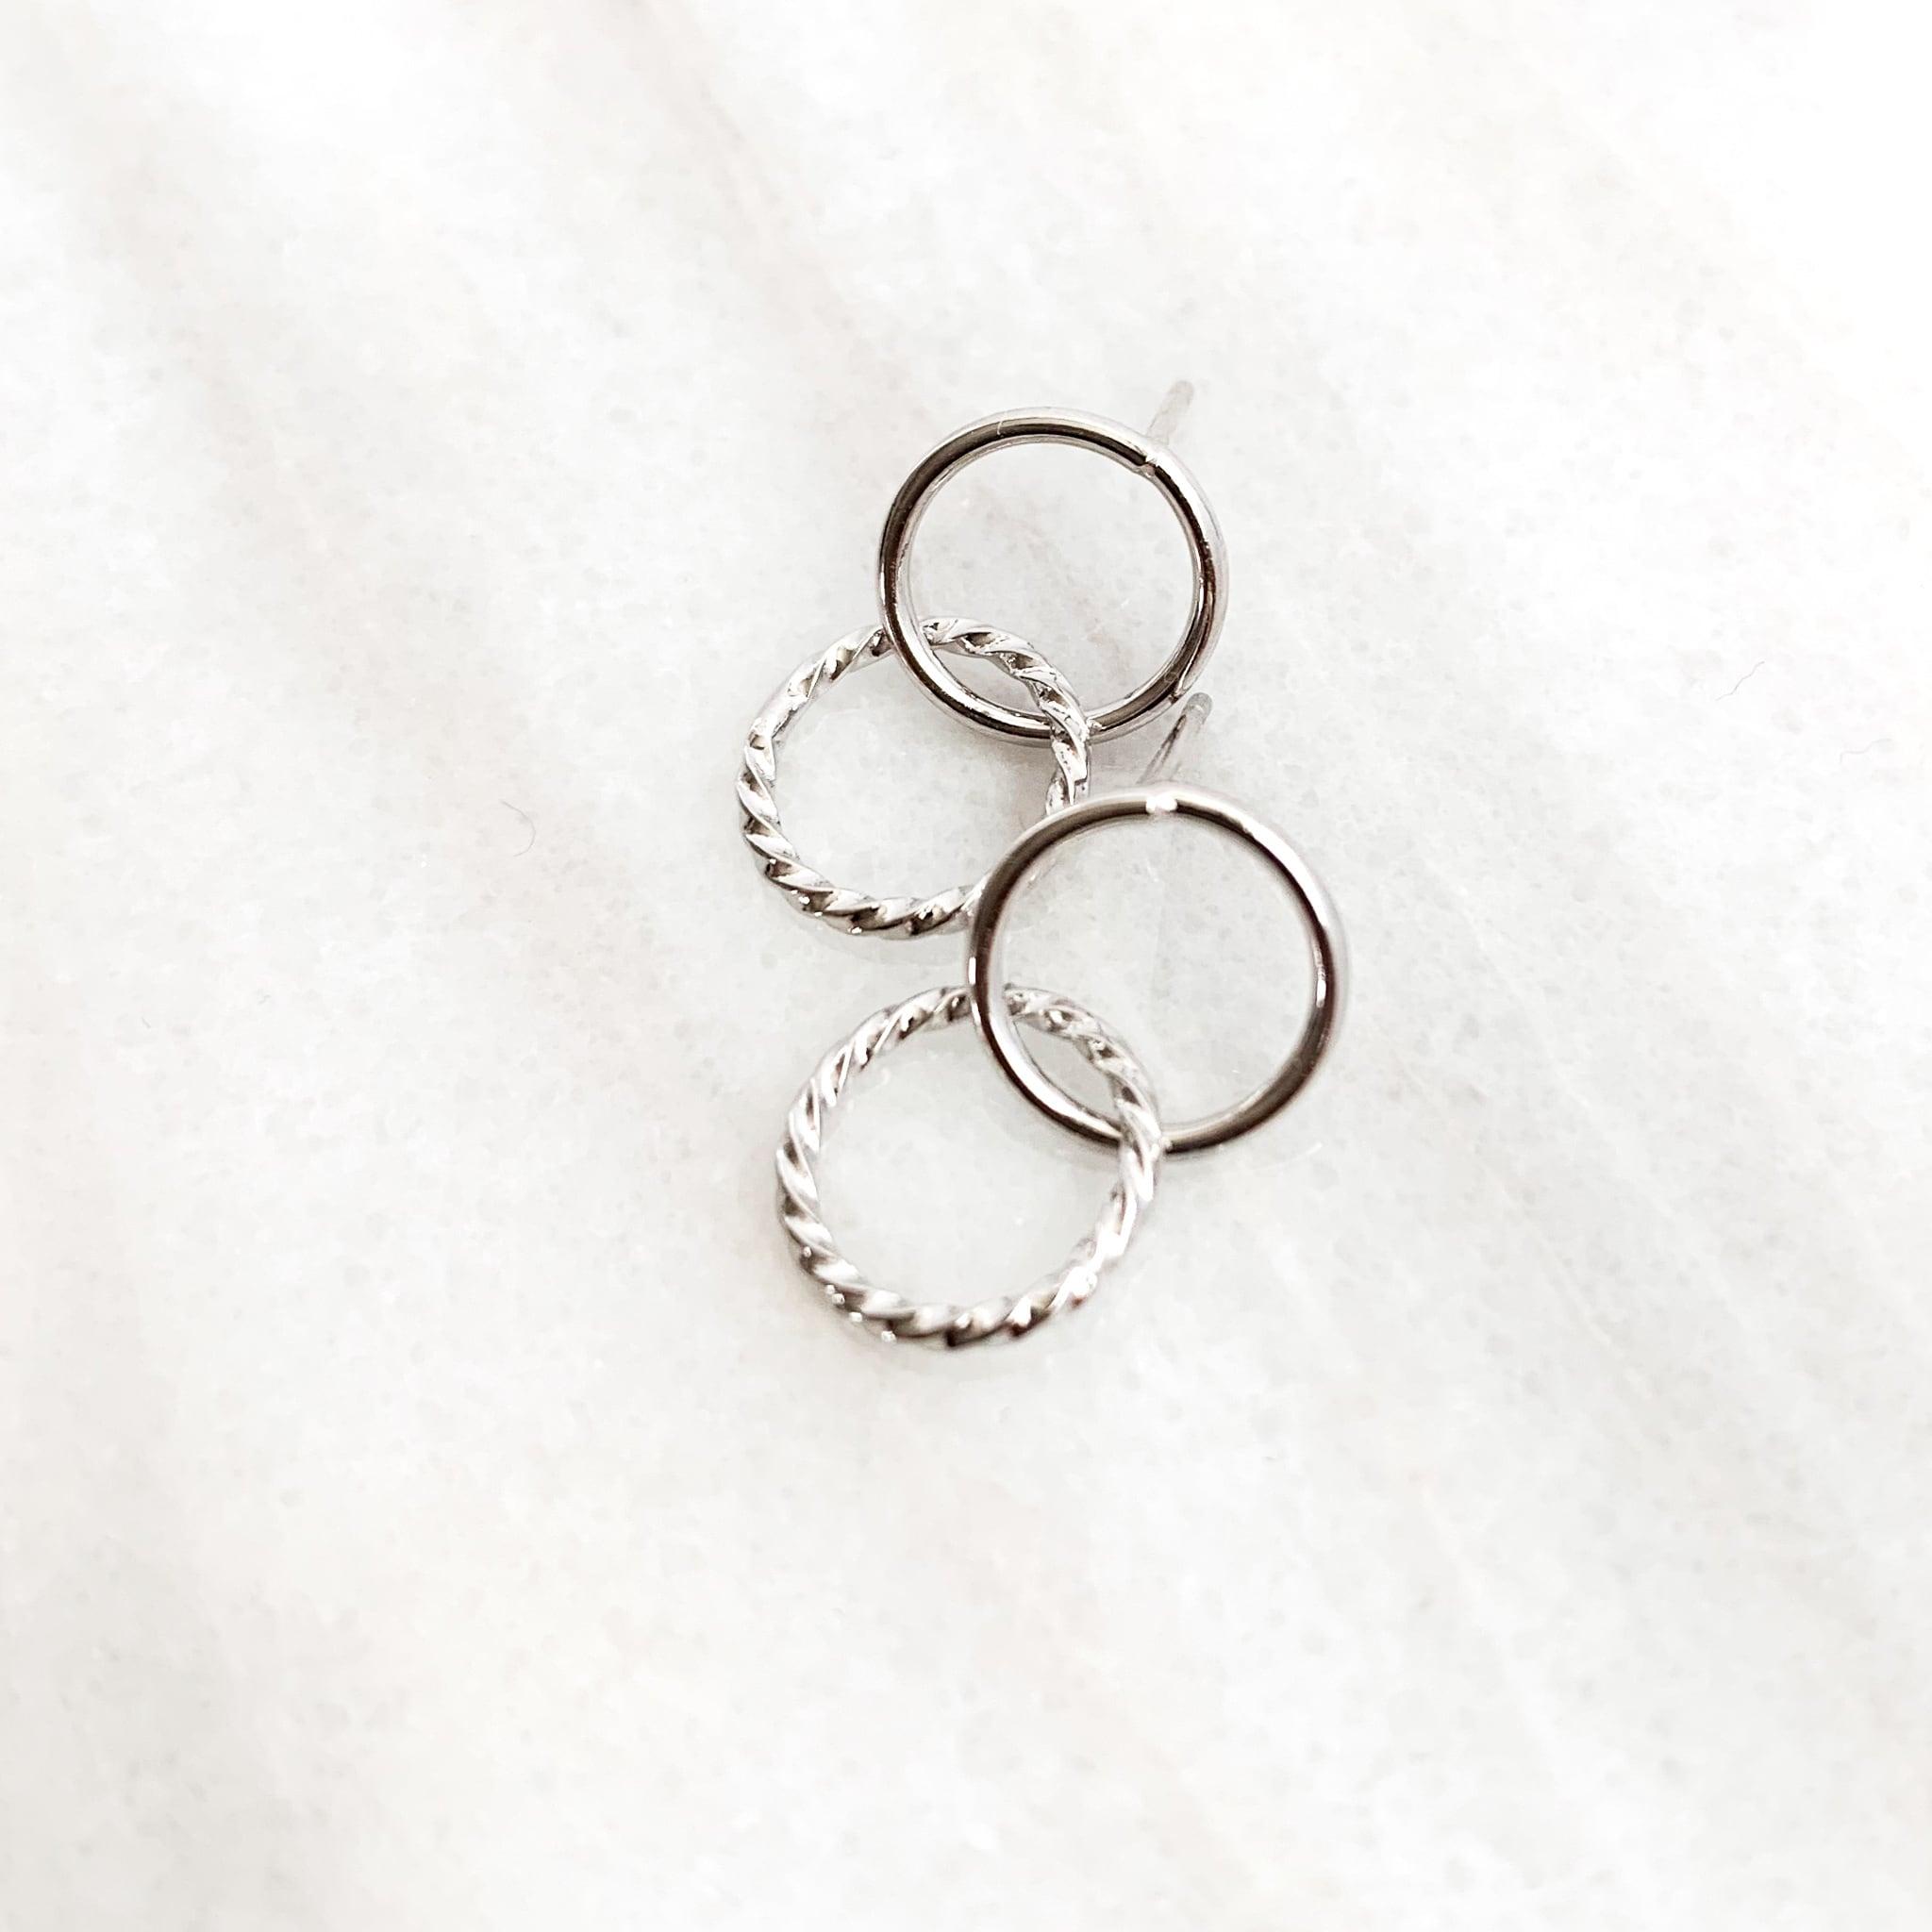 Double Ring Pierce silver n458